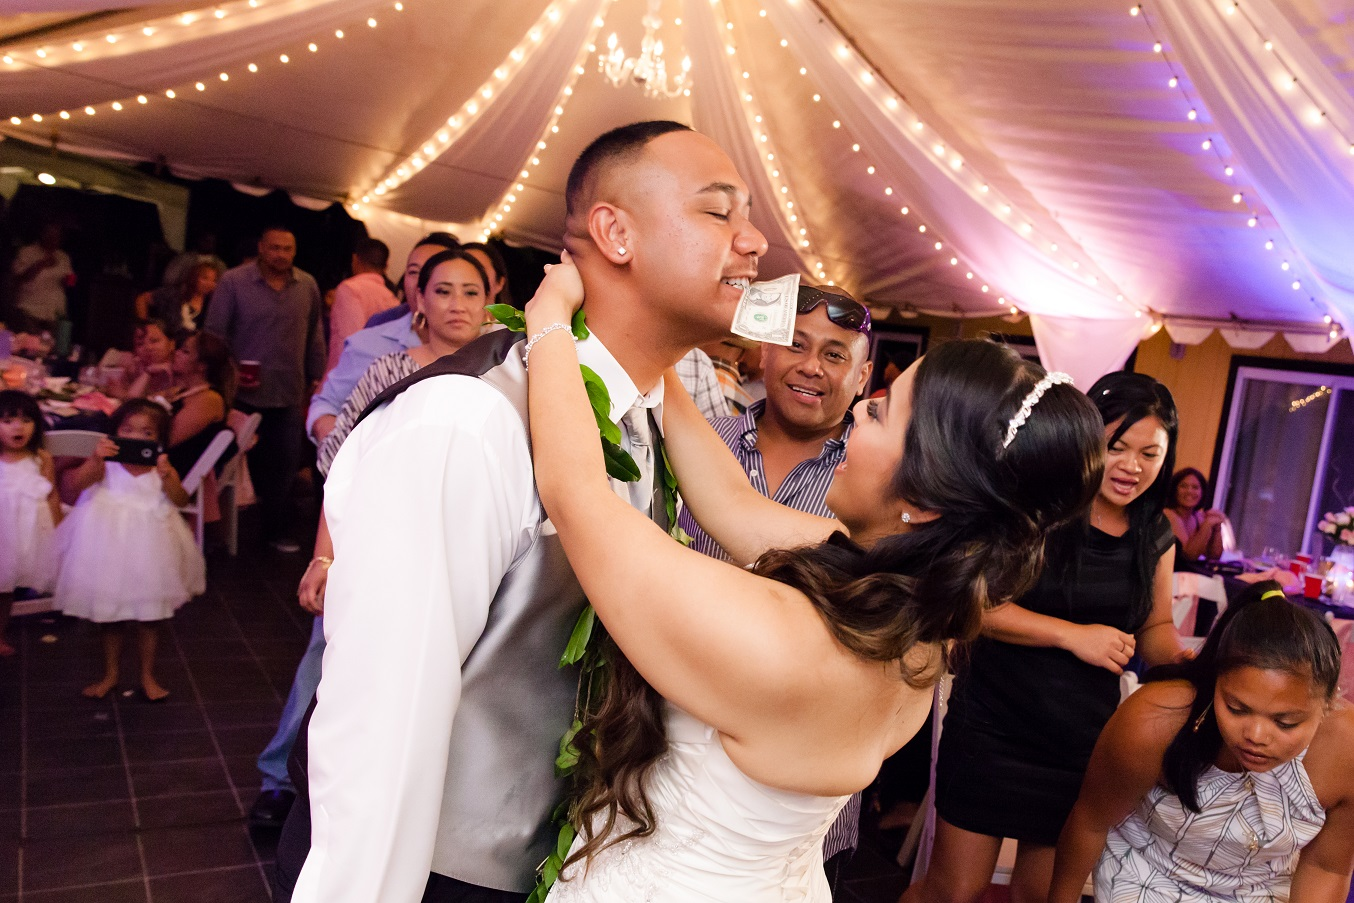 hawaiian wedding first dance party celebration